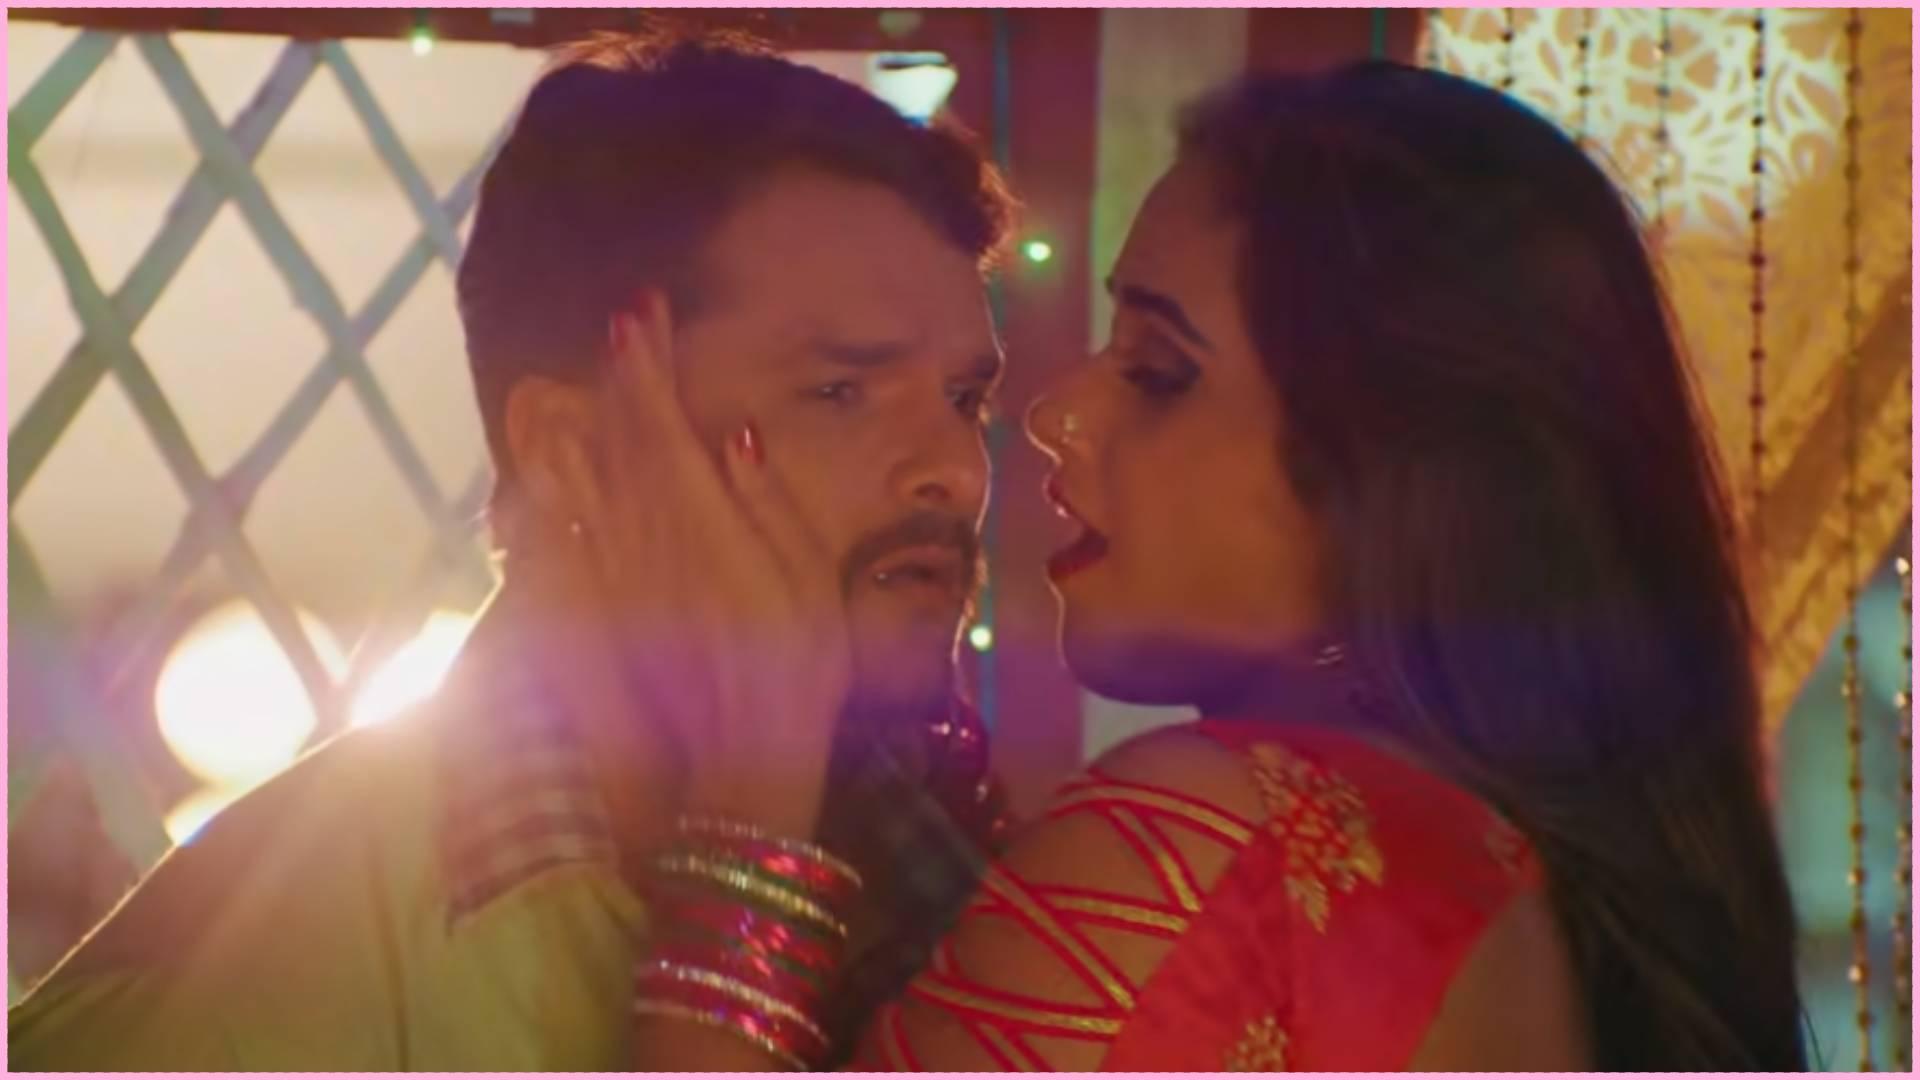 Khesari Lal Yadav-Kajal Raghwani Bold Video: 'पागल बनइबे' ने मचाया धमाल, अब तक मिले 10 करोड़ से ज्यादा व्यूज